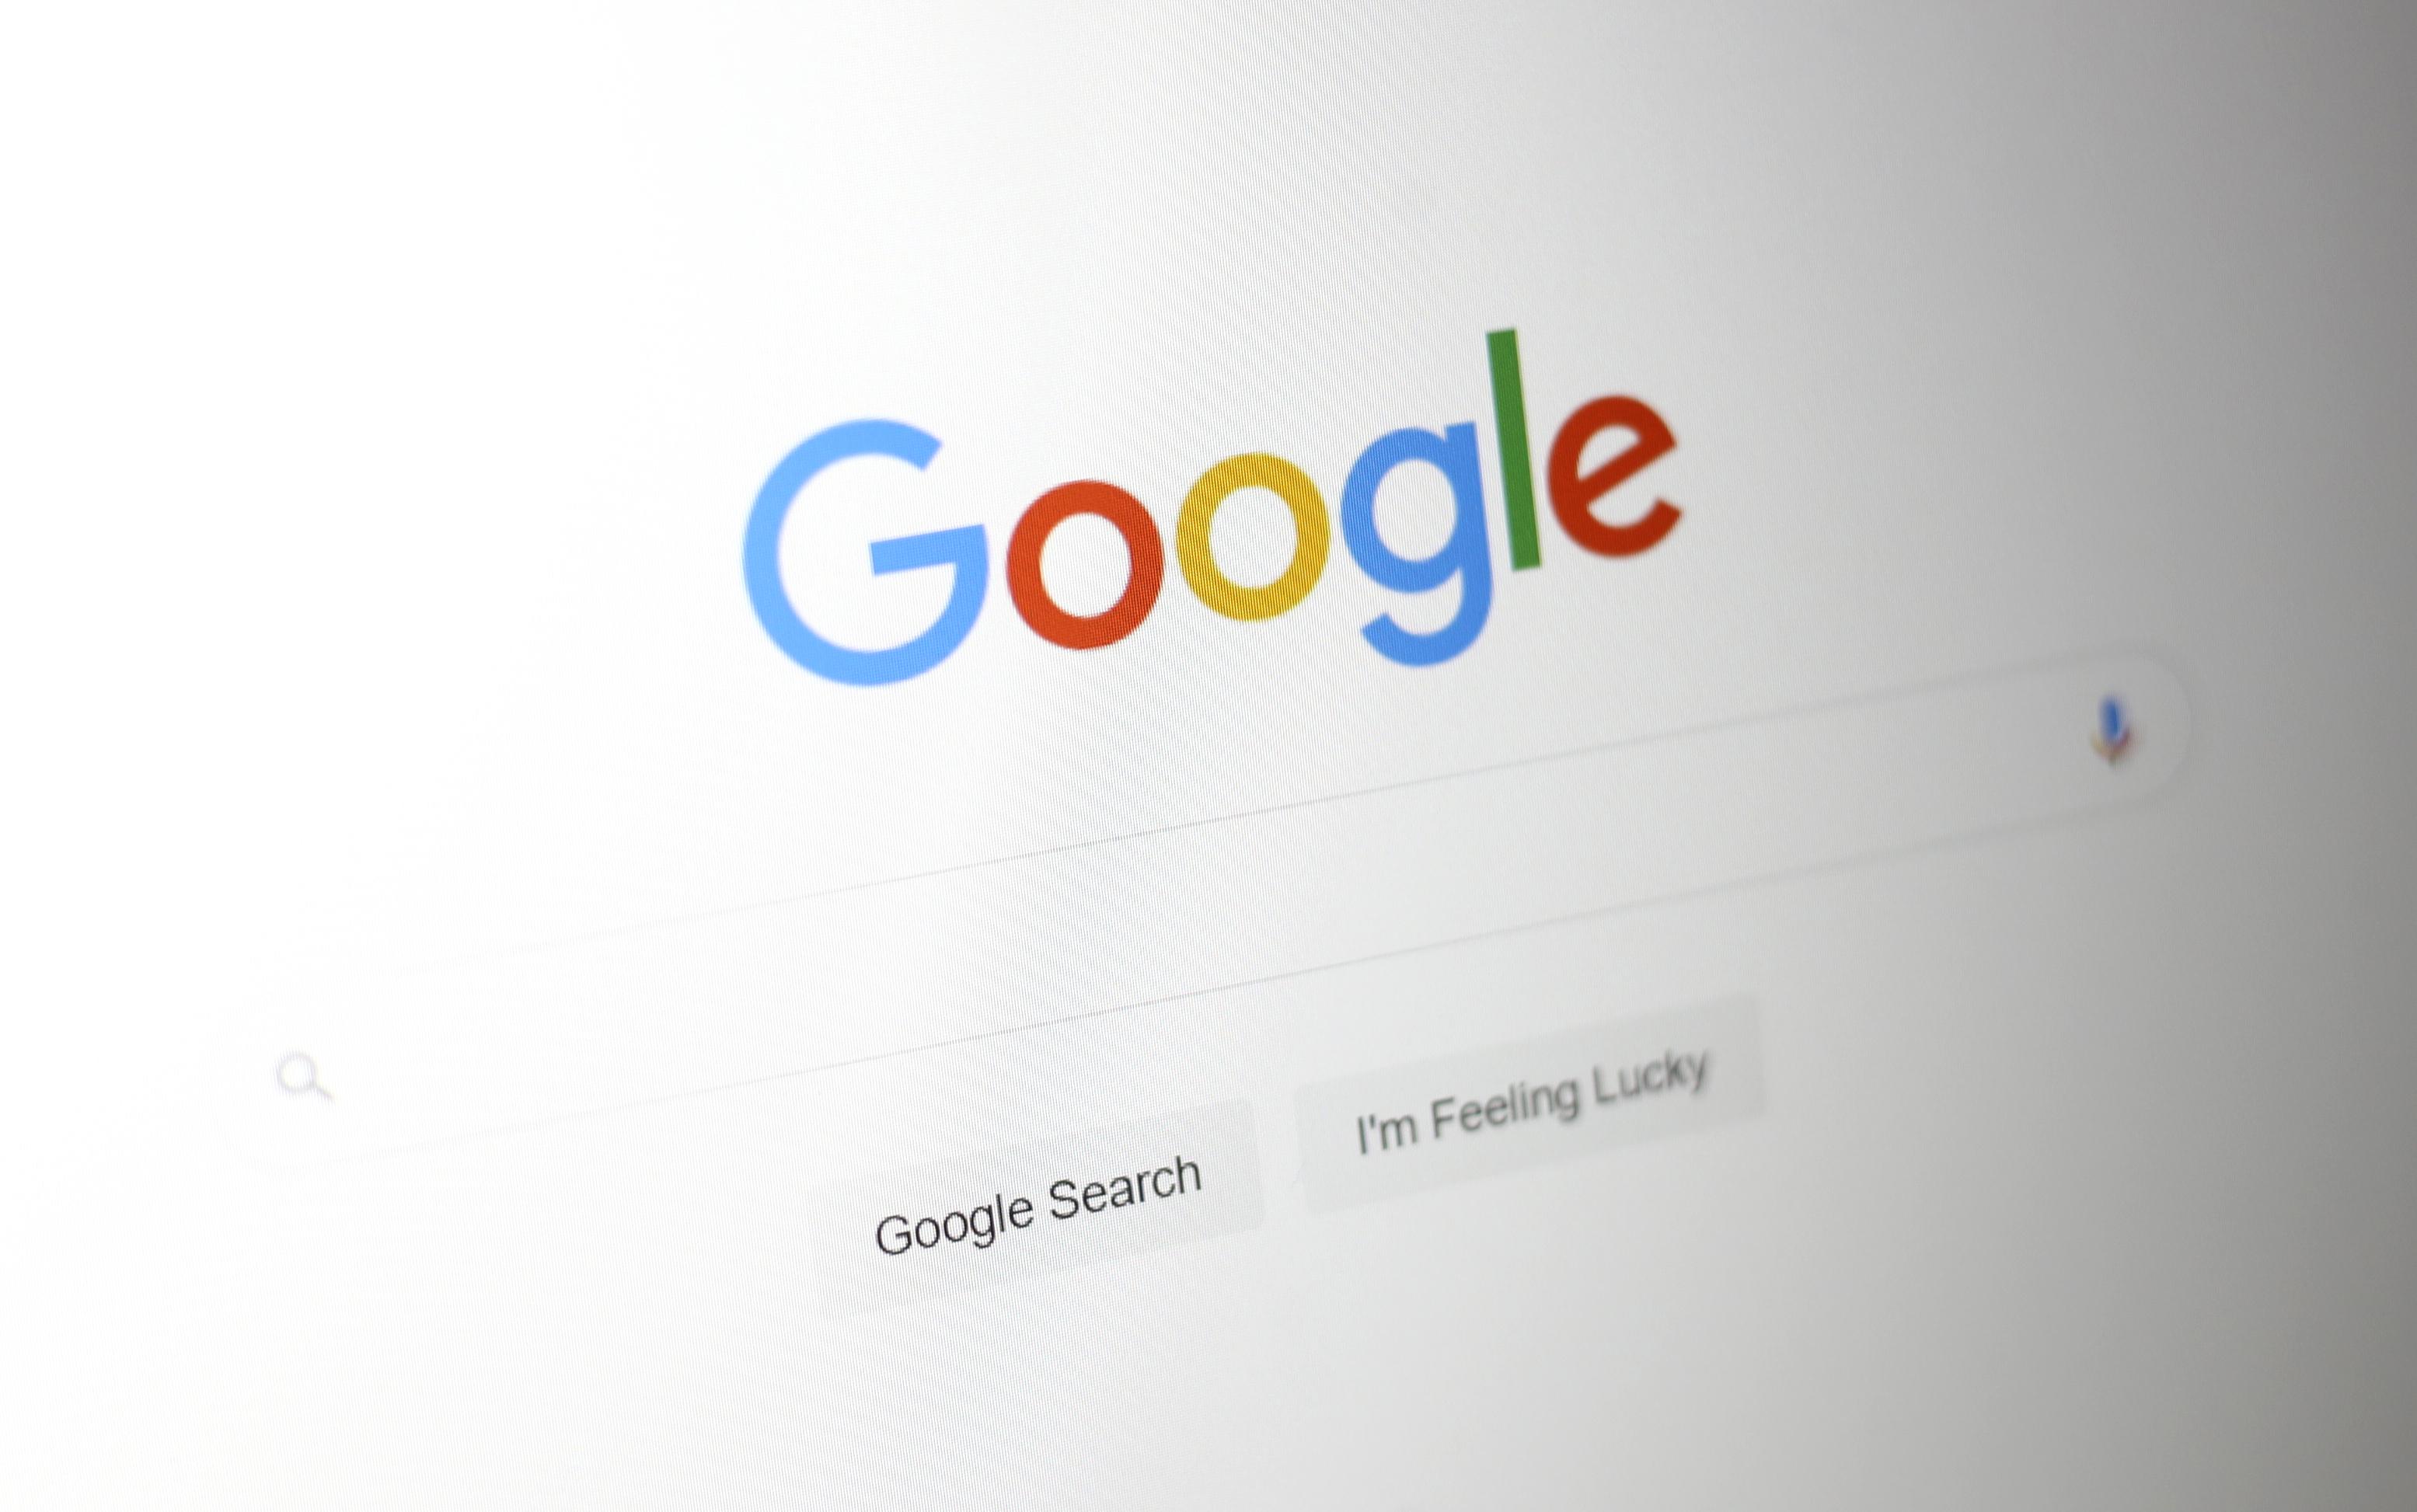 Google's homepage.